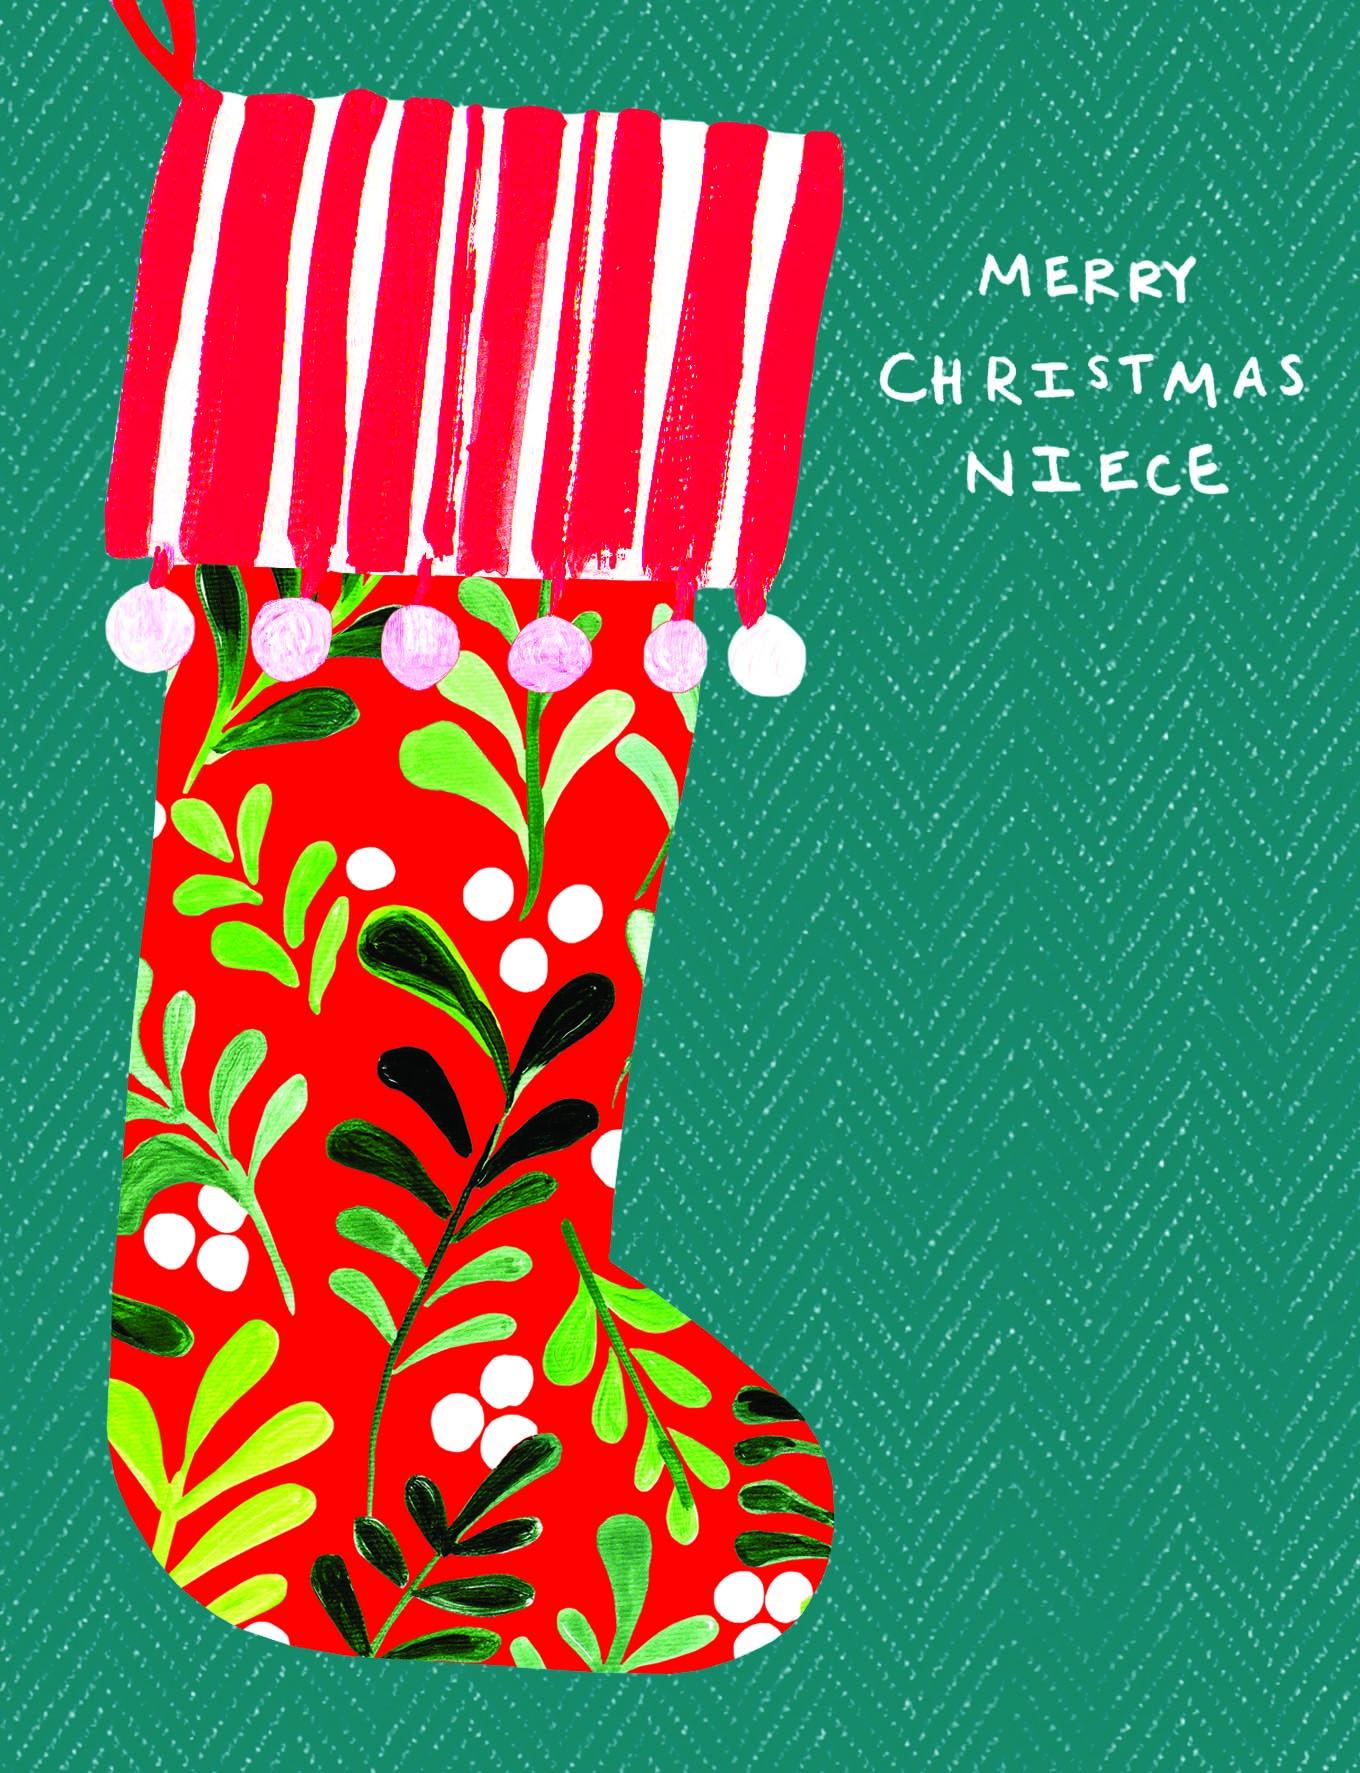 Merry Christmas Niece.Merry Christmas Niece Card